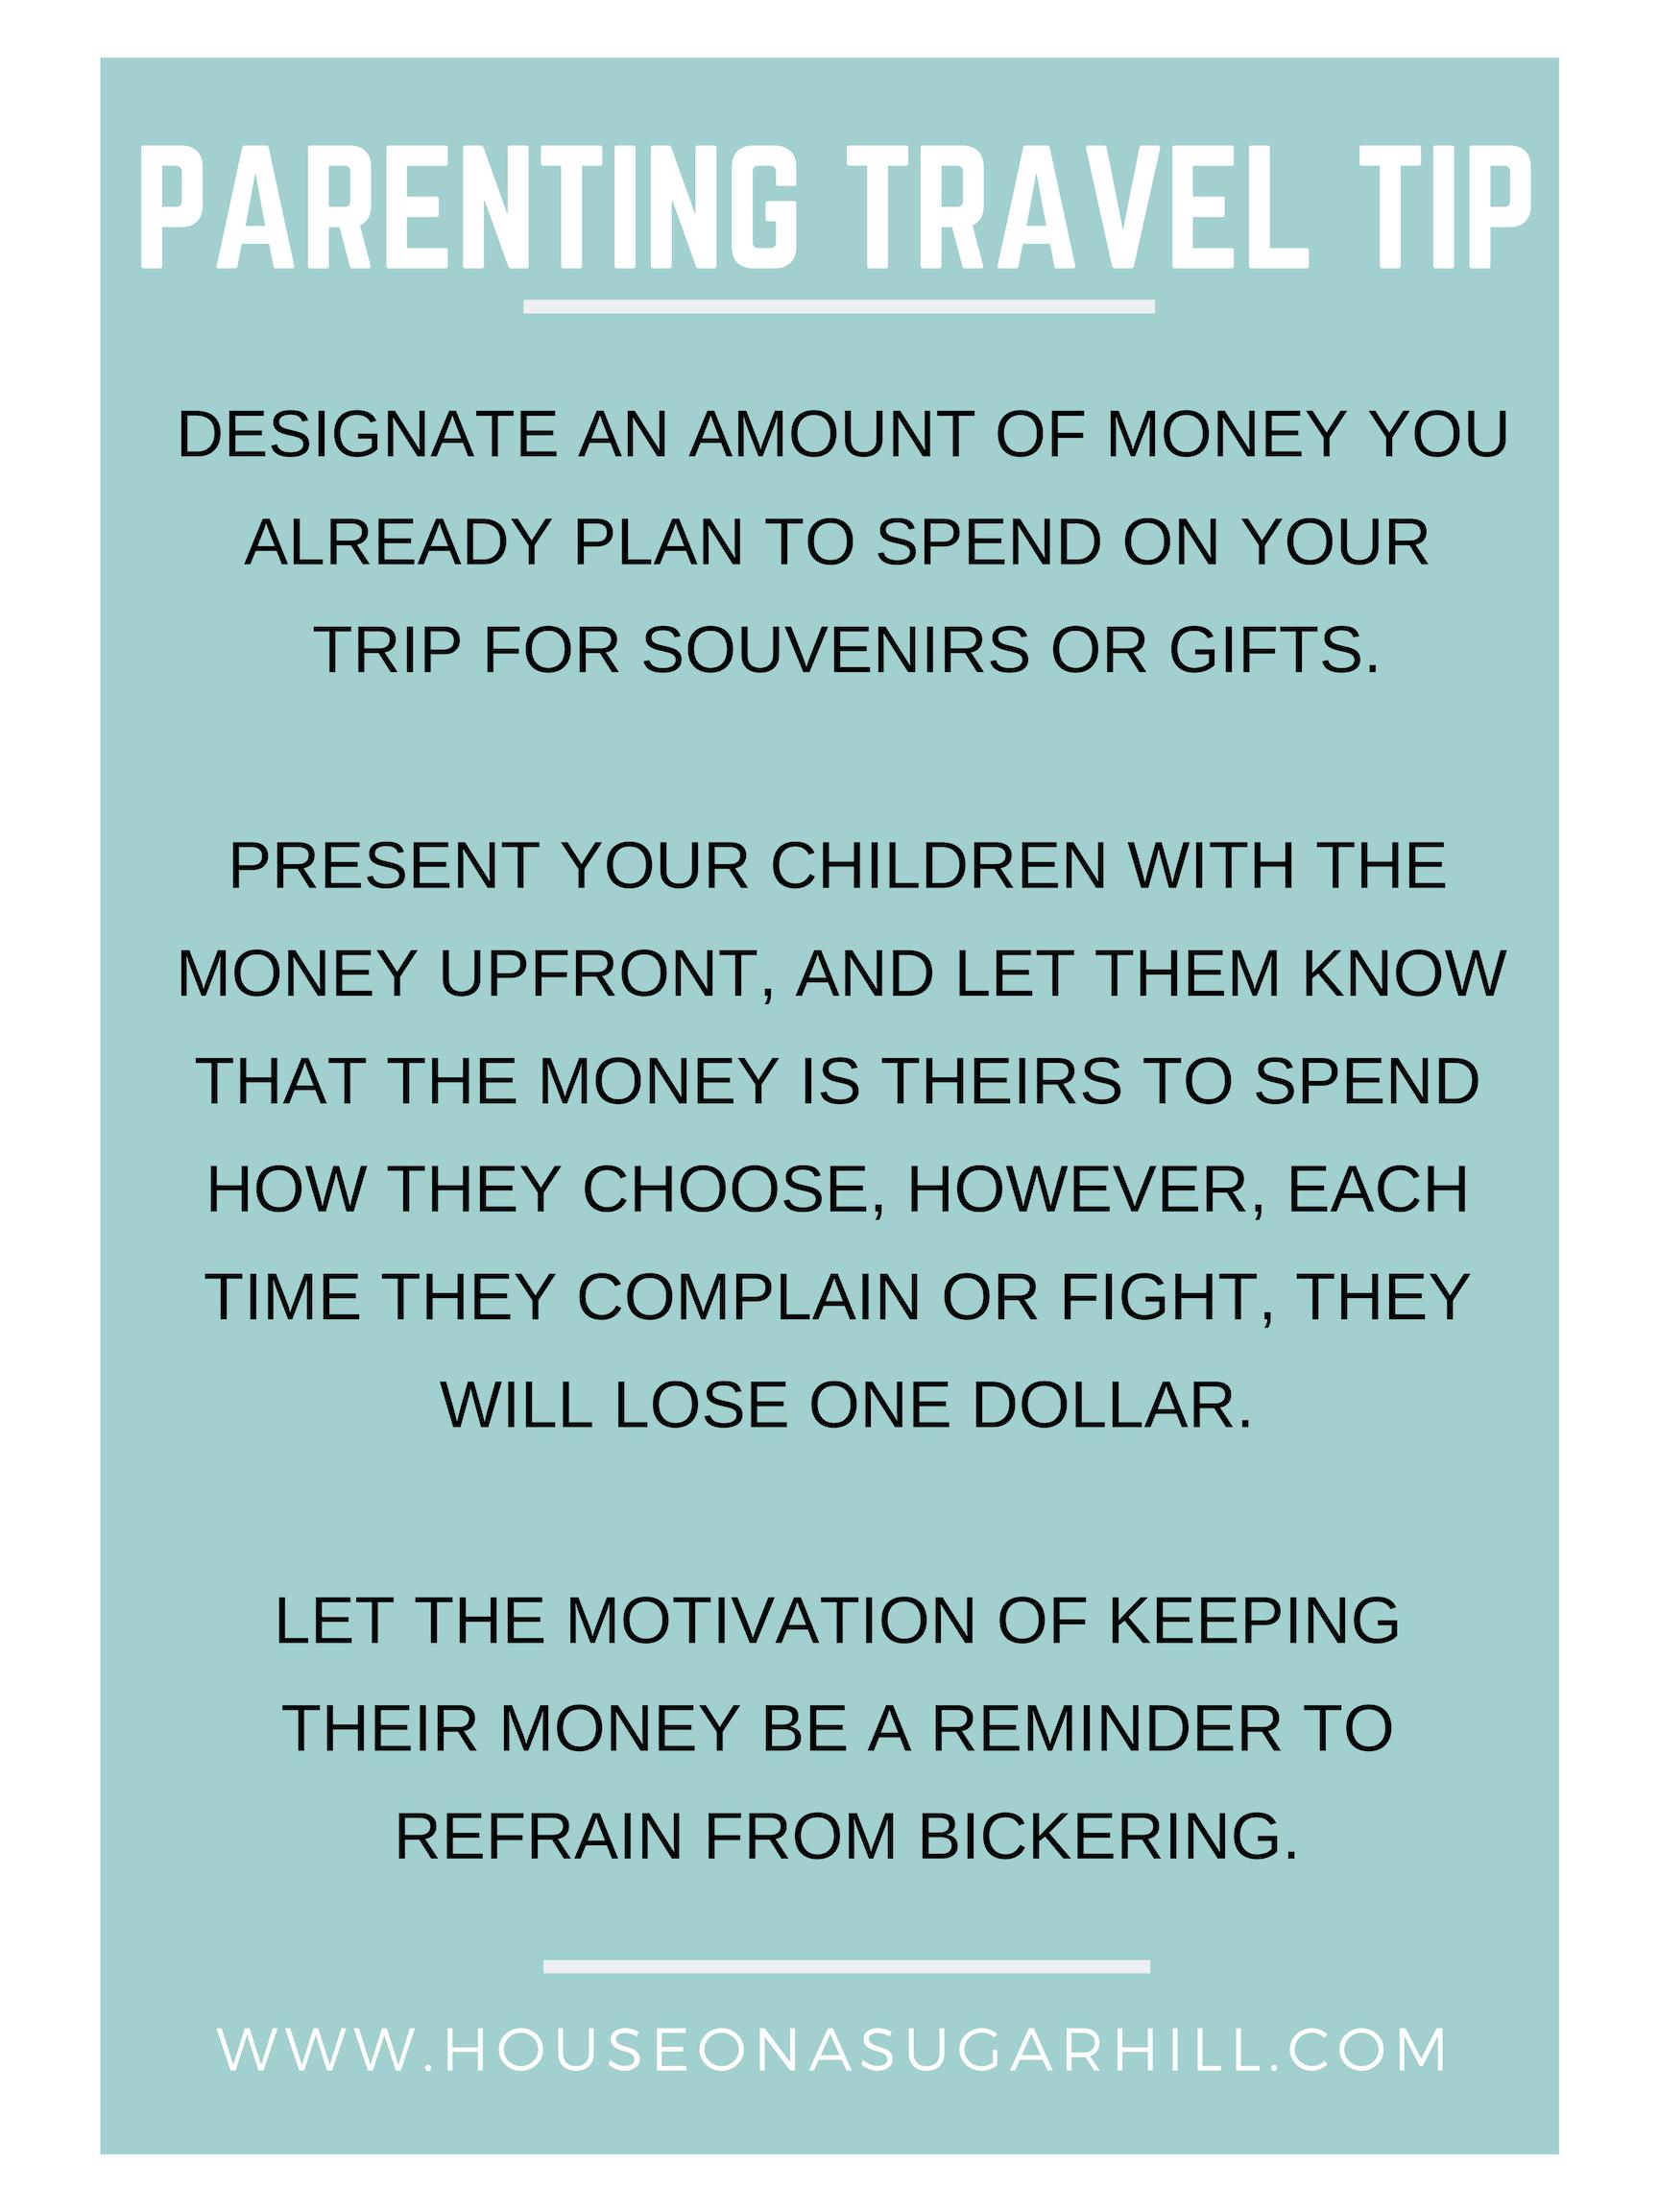 parenting travel tip (2).png